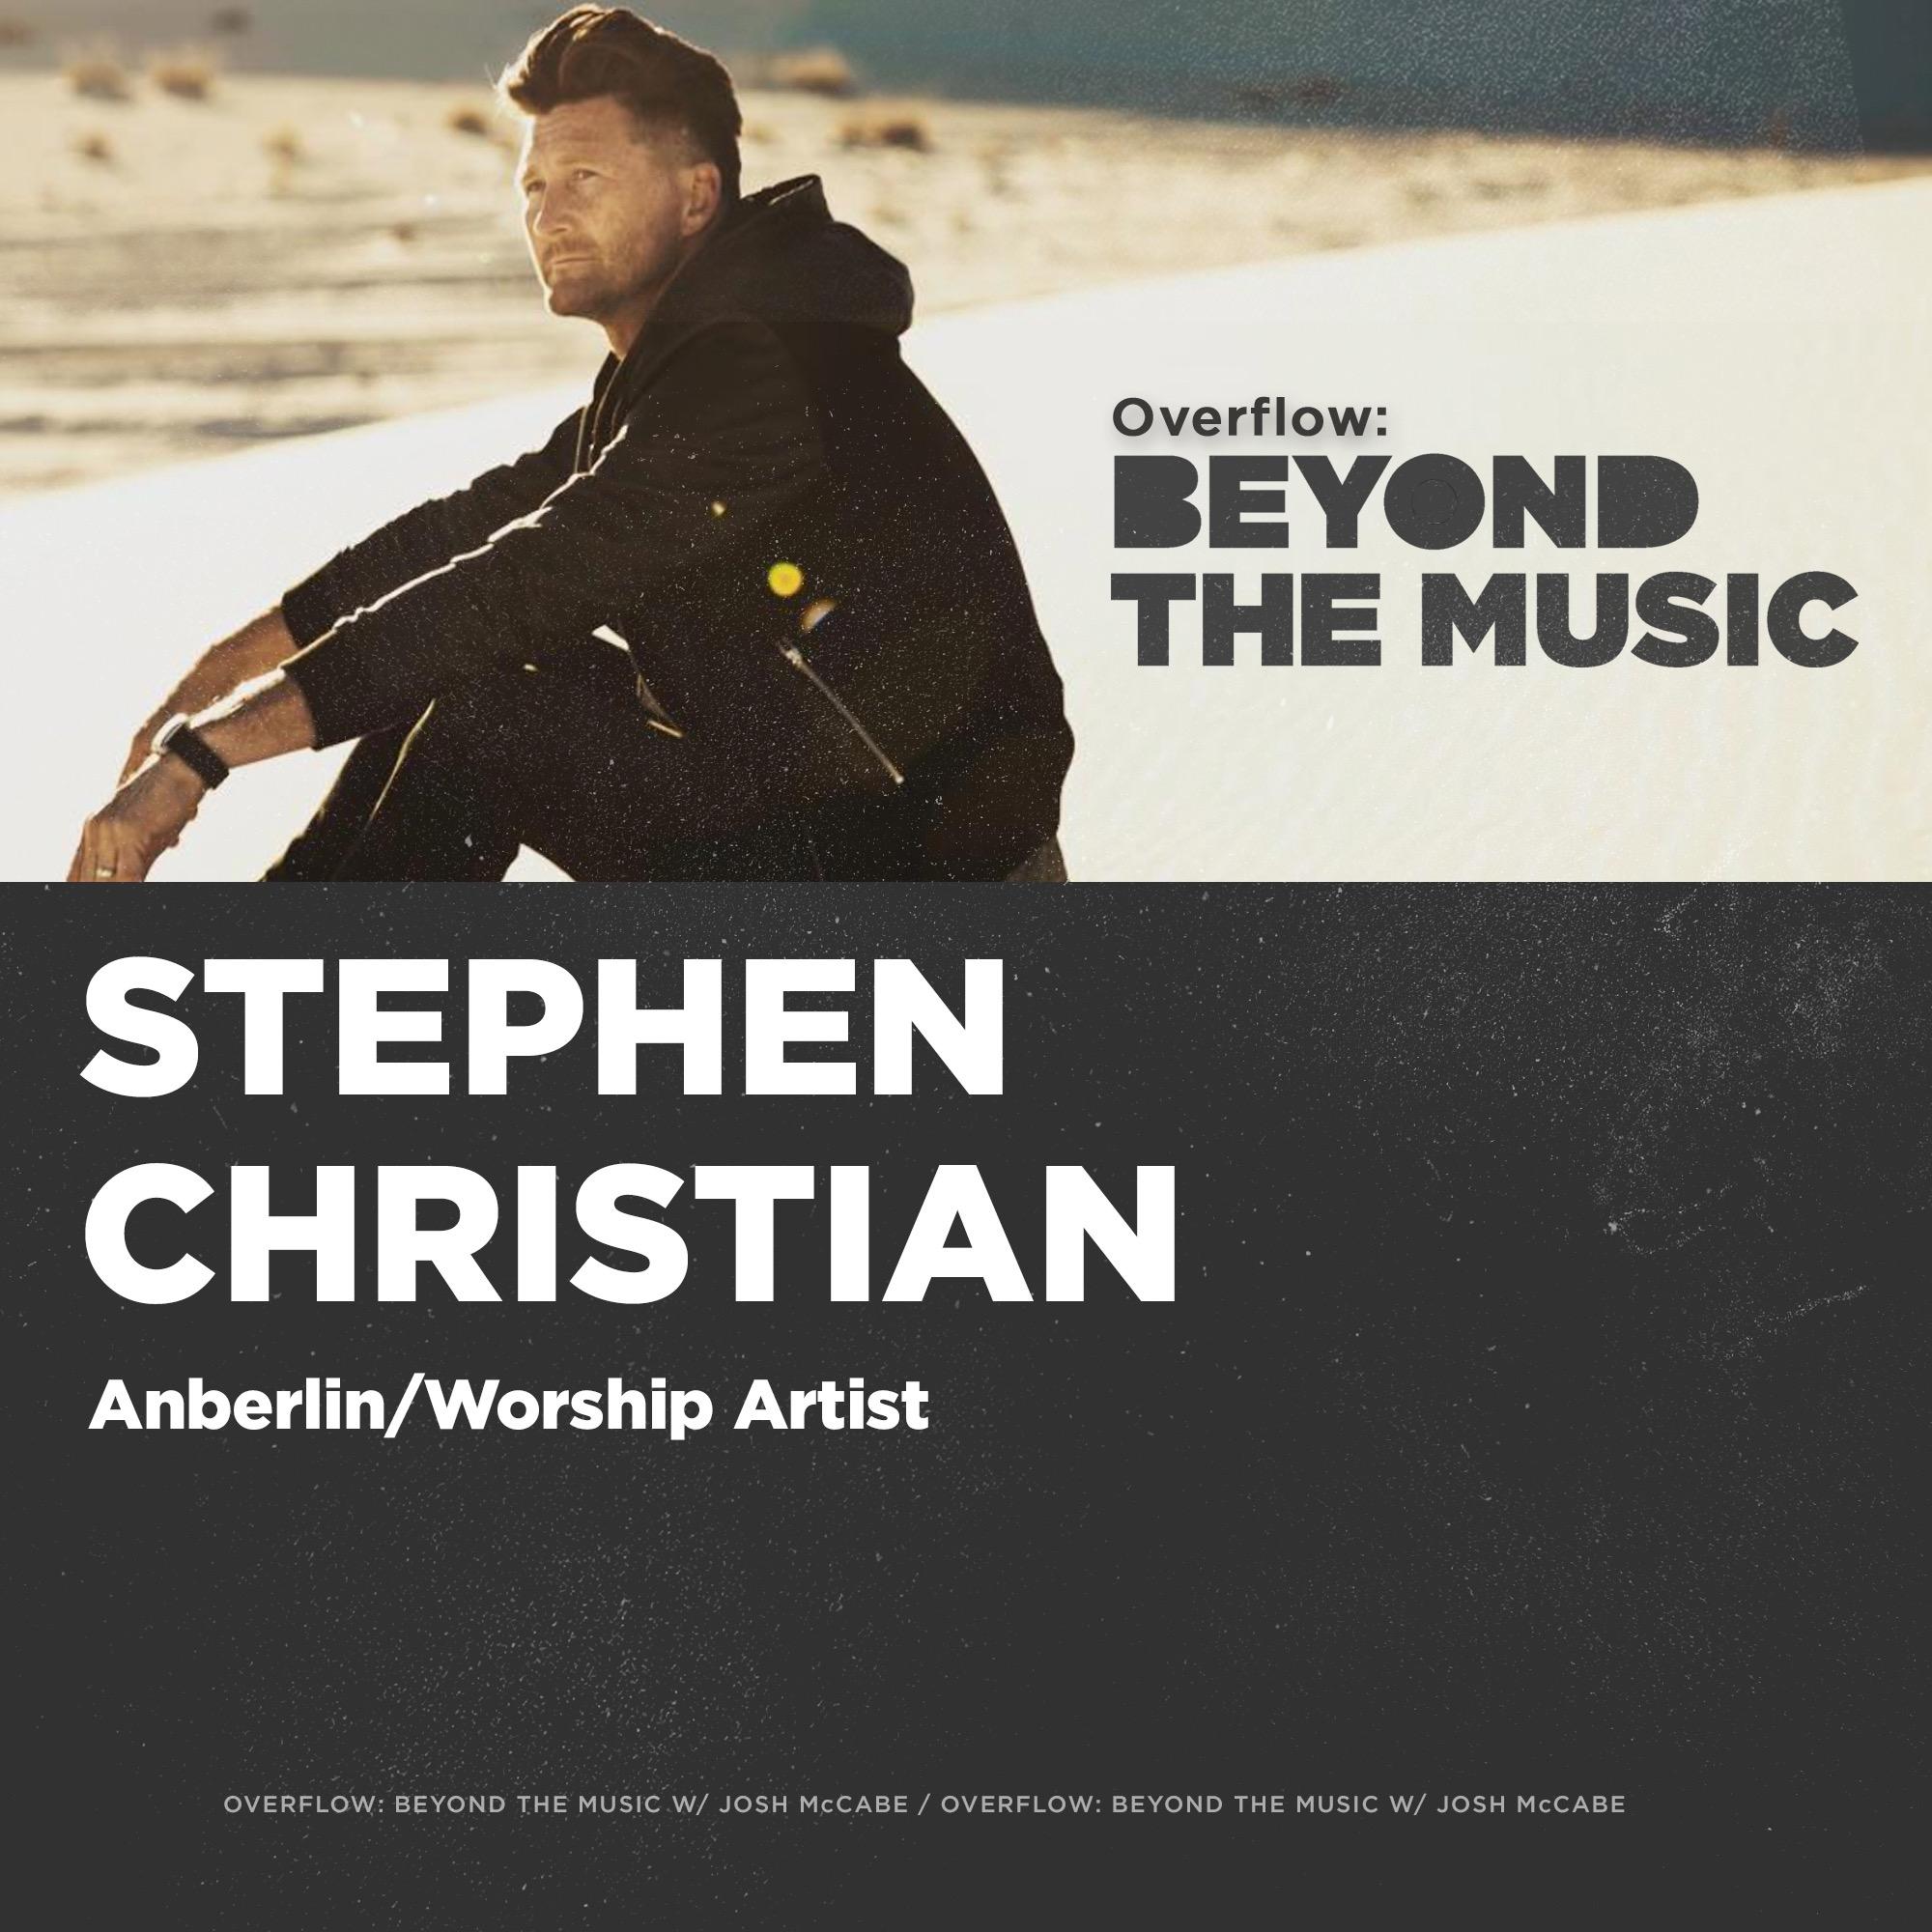 Anberlin's Stephen Christian